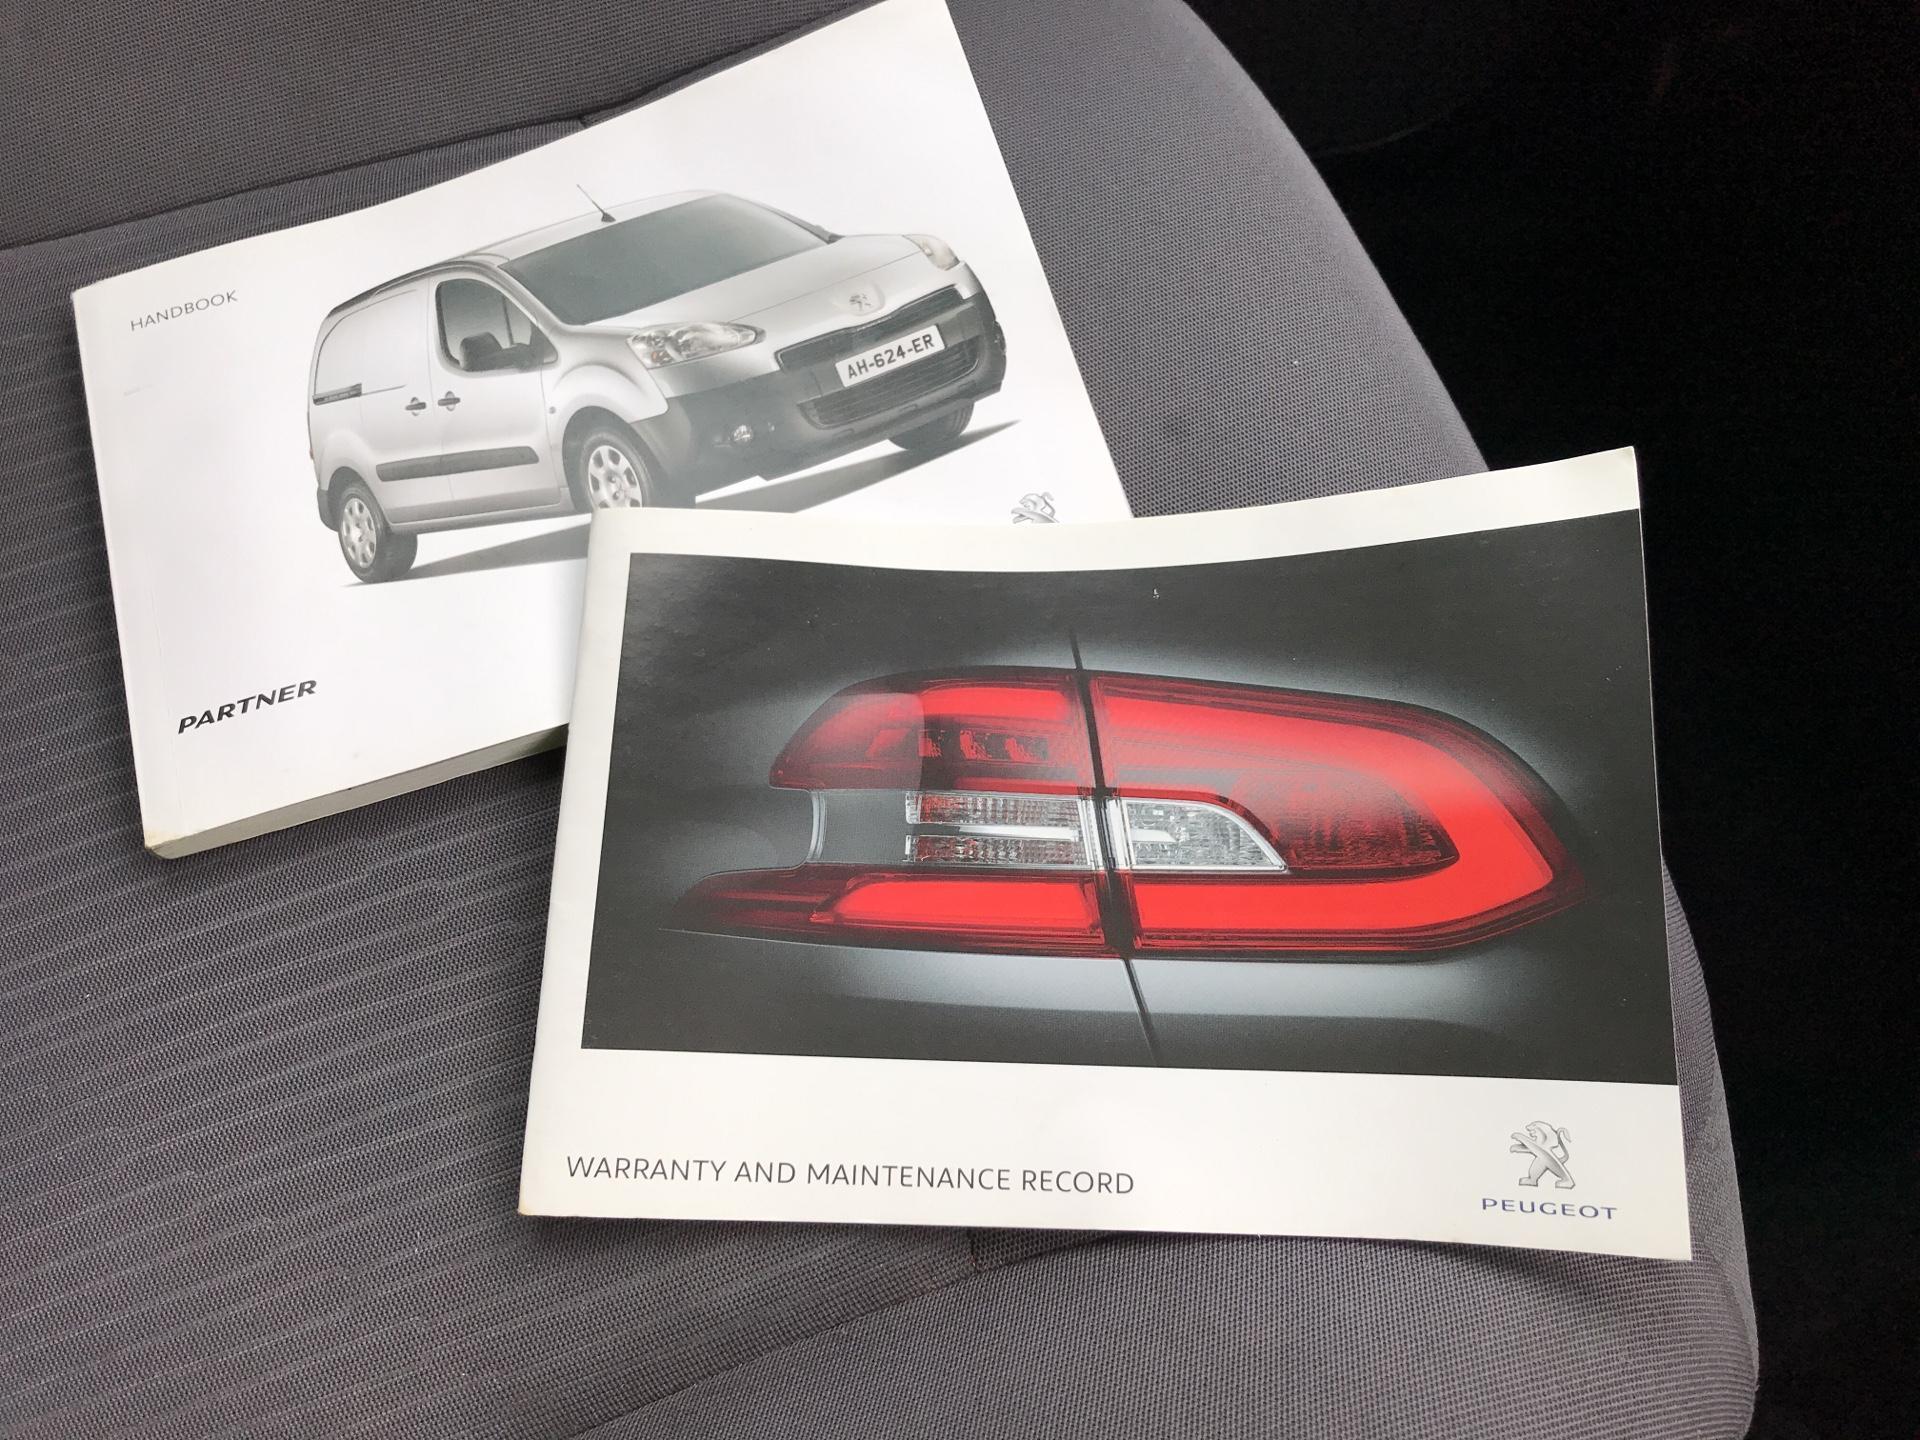 2014 Peugeot Partner L1 850 S 1.6HDI 92PS EURO 5 (NU64DWM) Image 24